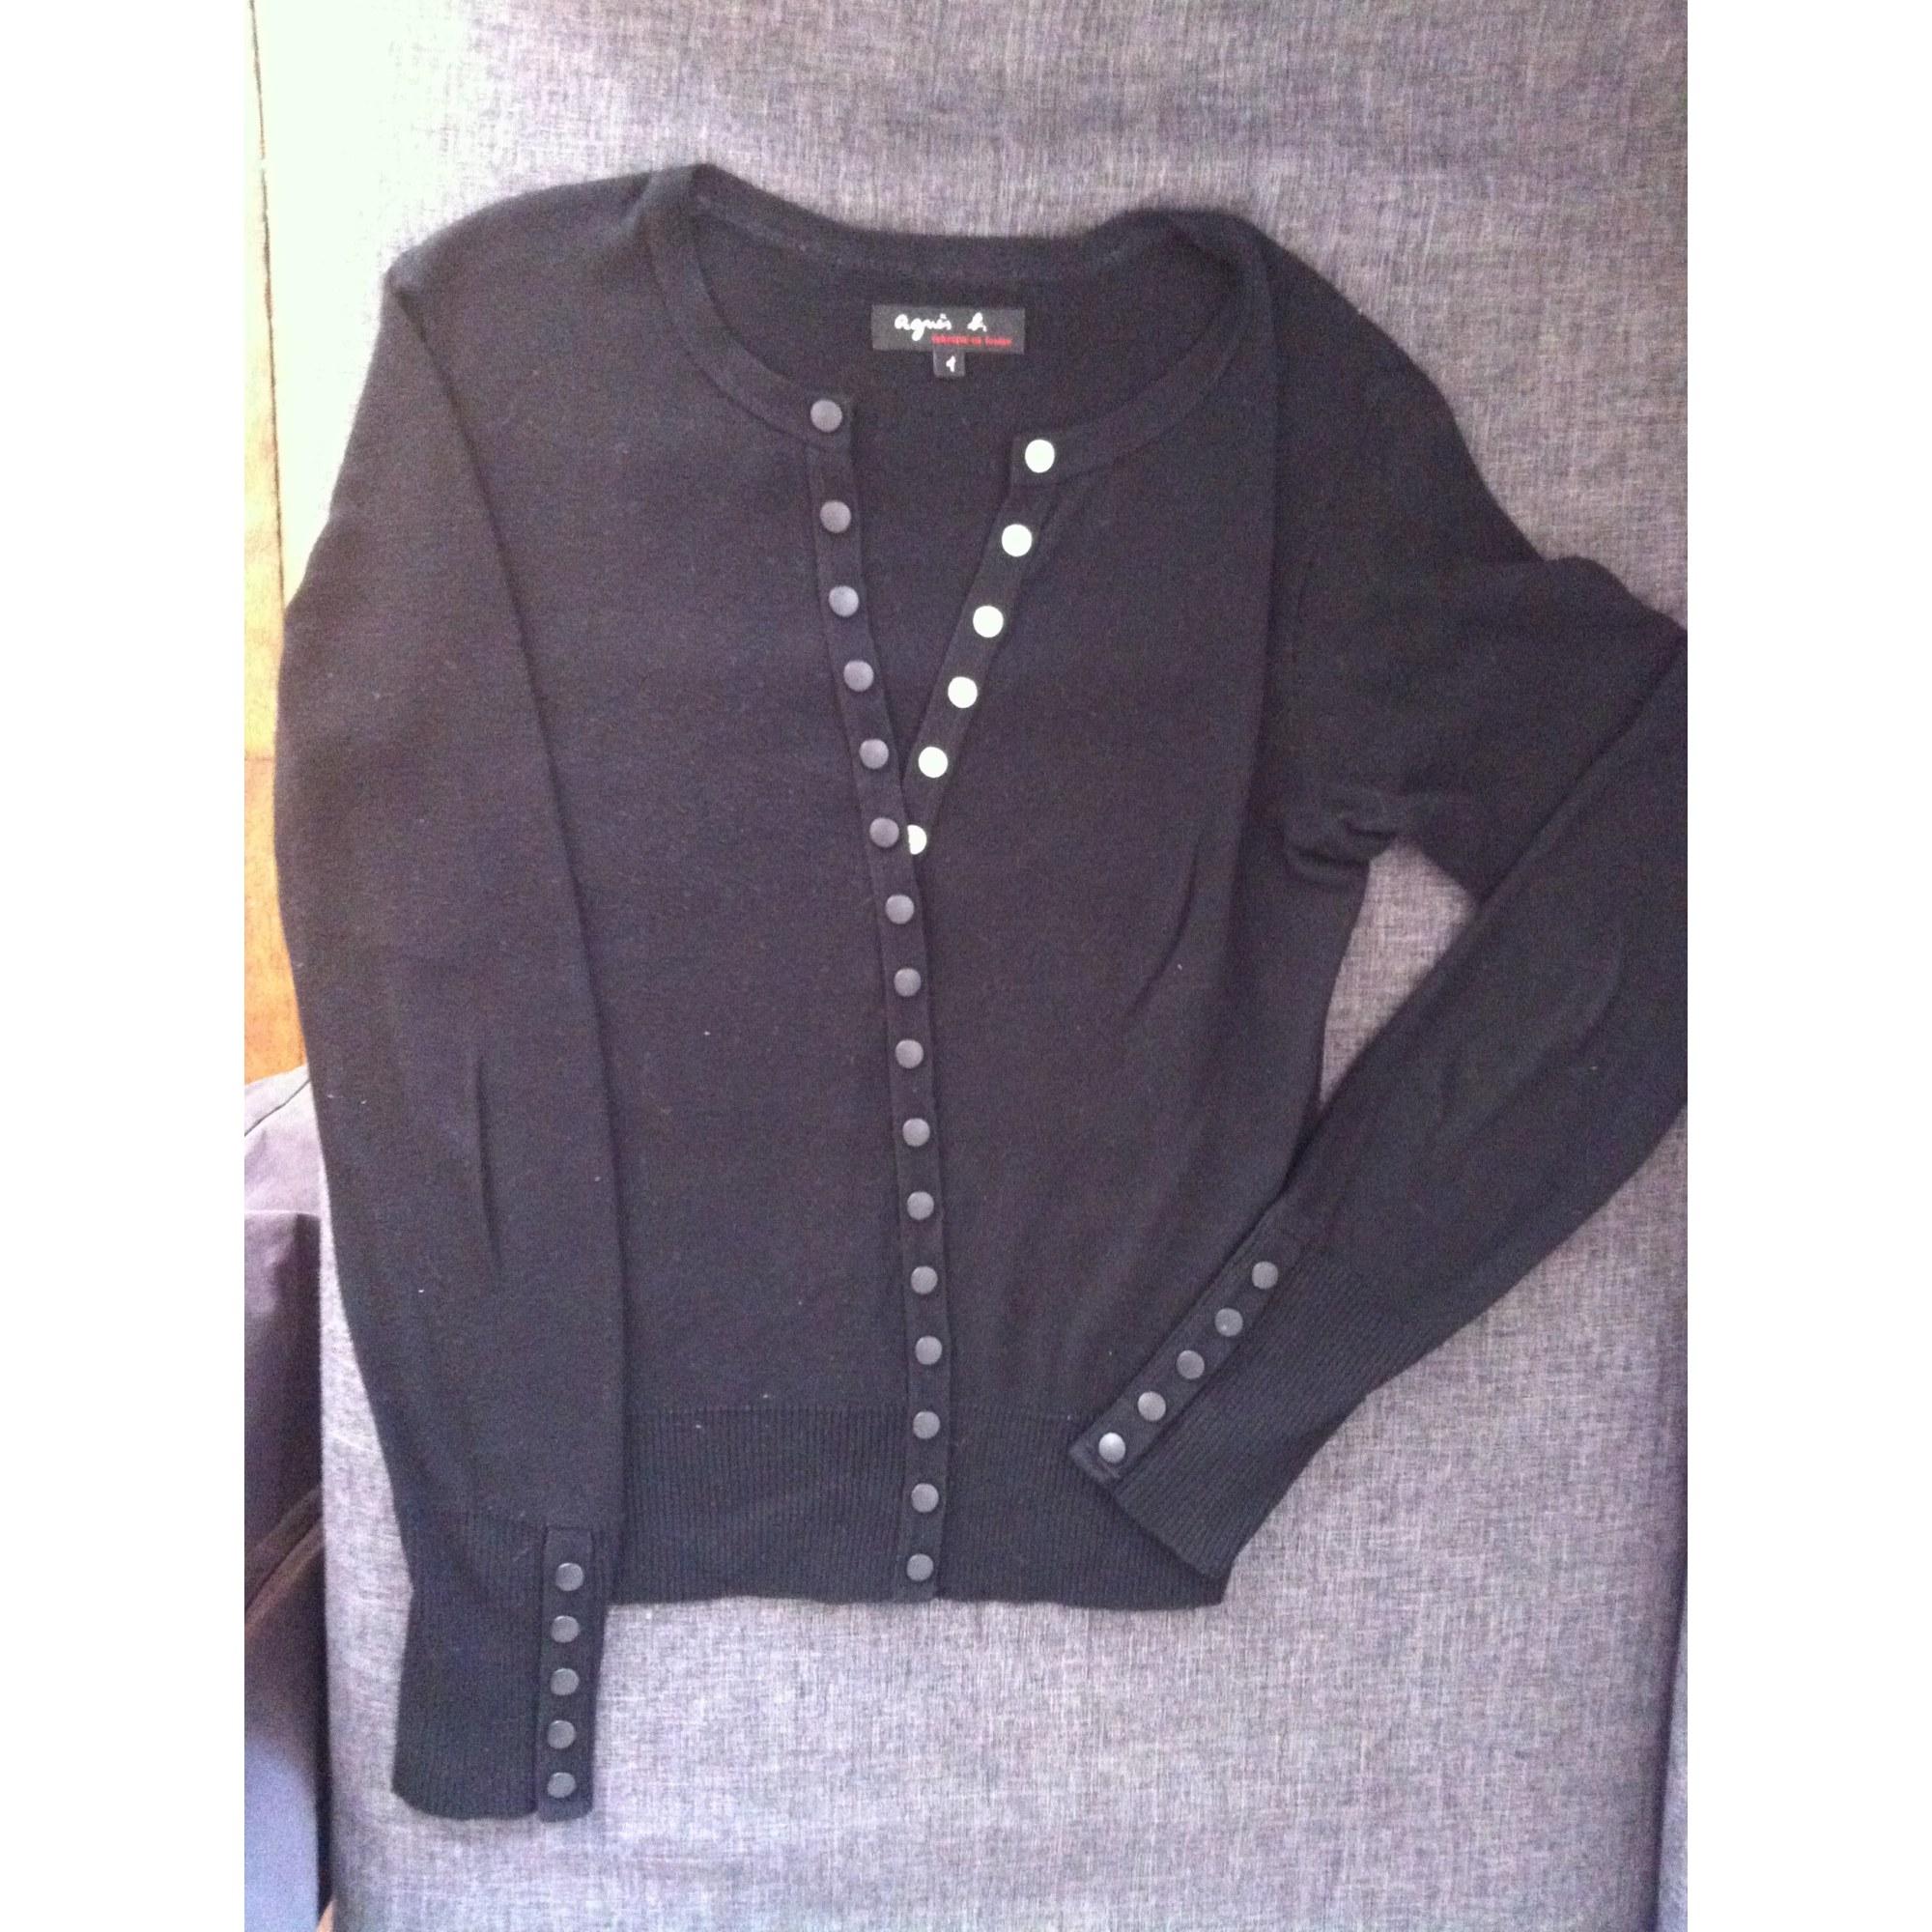 Vendu Noir Par Cardigan Gilet 165280883 Agnès Sarah s B T1 36 1YOFS